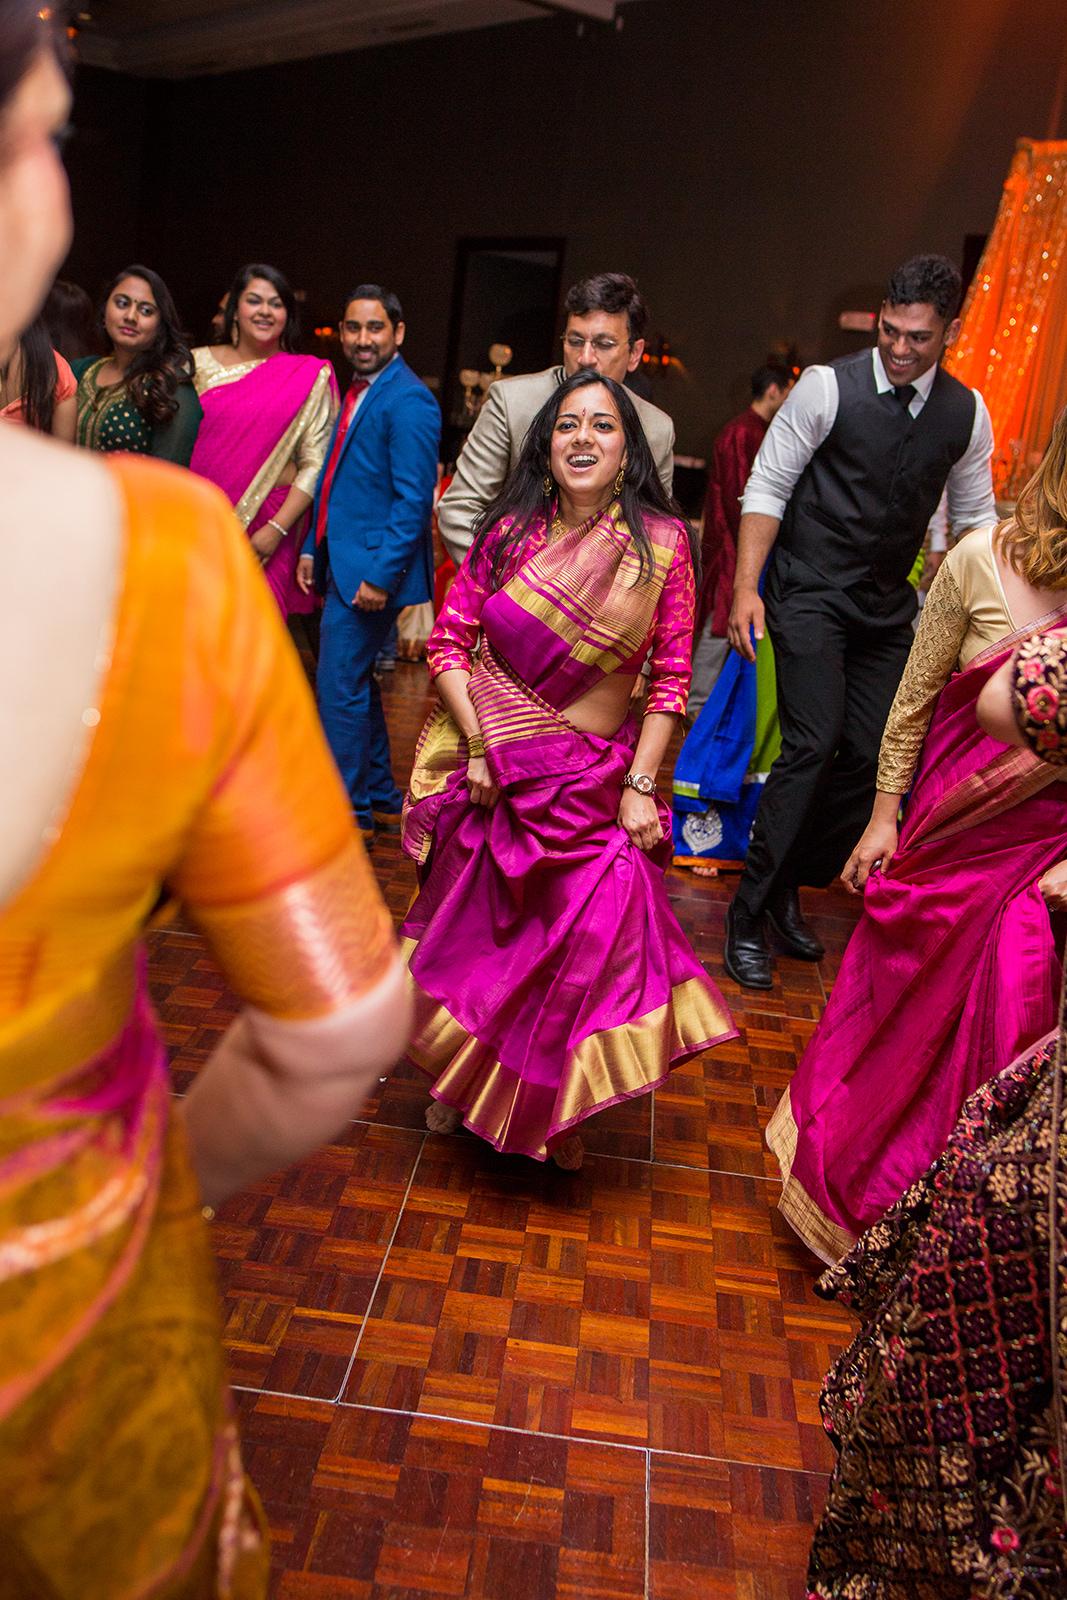 Le Cape Weddings - South Asian Wedding - Ishani and Sidhart - Wedding Reception-191.jpg